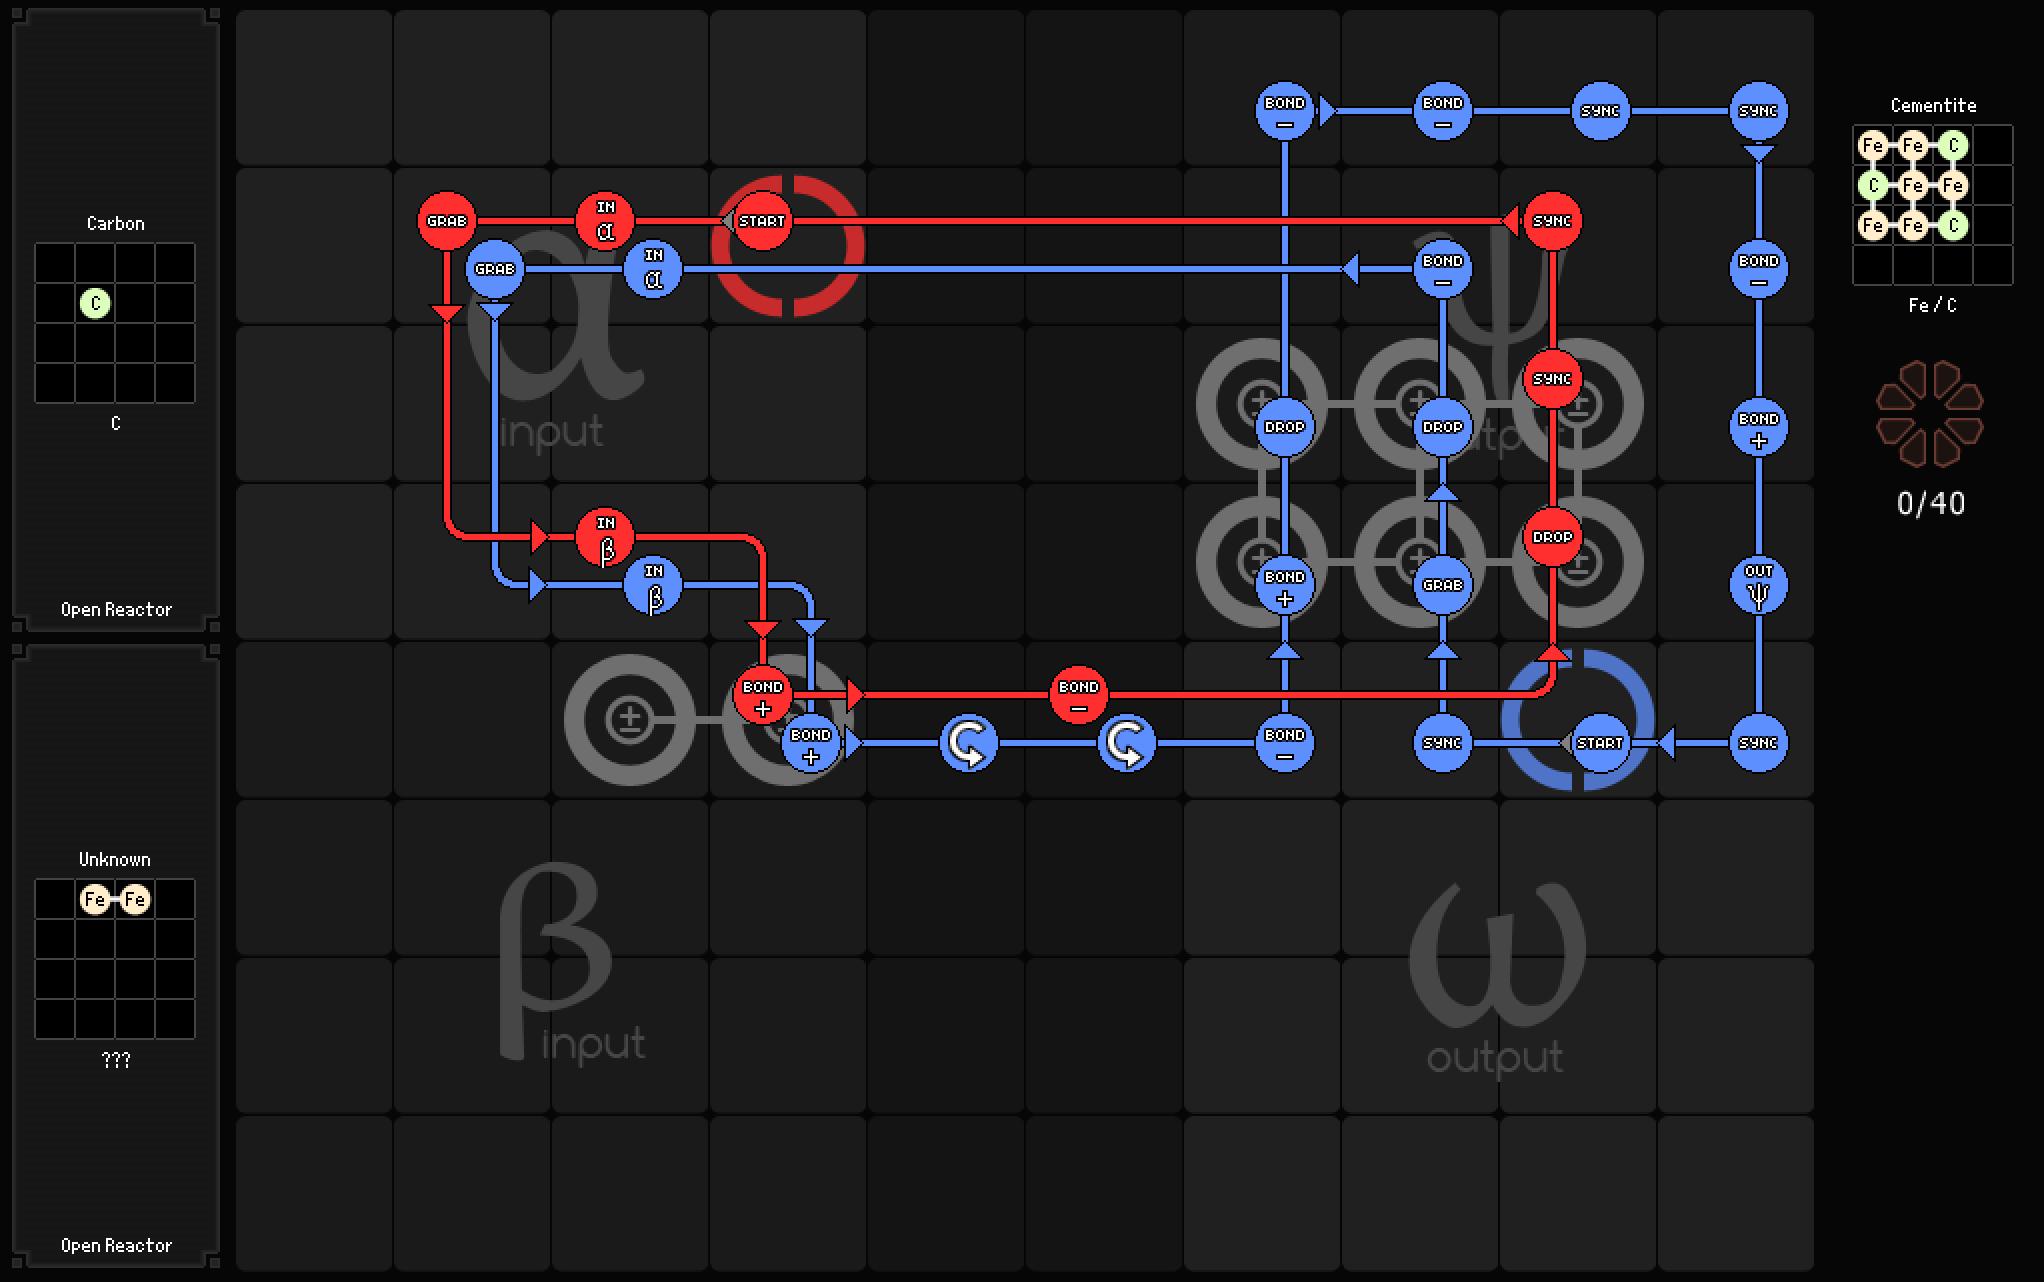 1_Story_Mode/6_Hephaestus_IV/SpaceChem-6.5.a/Reactor_3.png